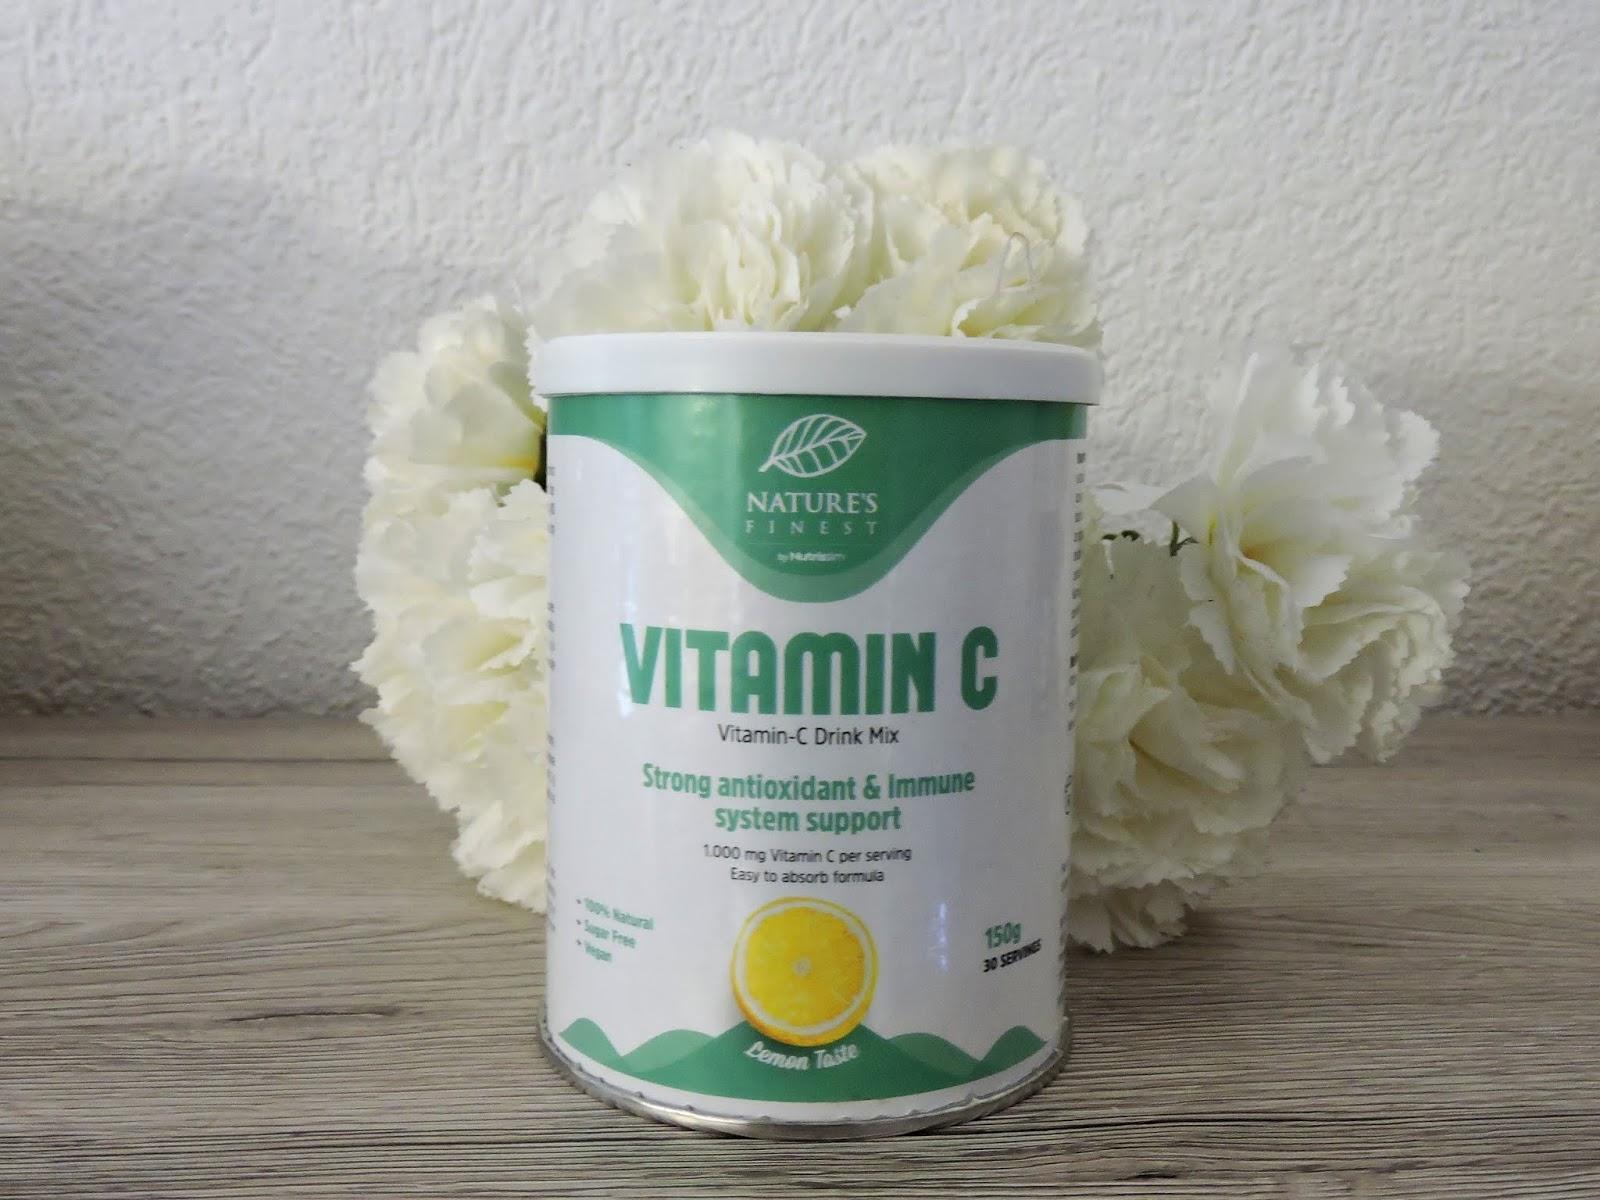 Vitamine C Nutrisslim biobox février 2019